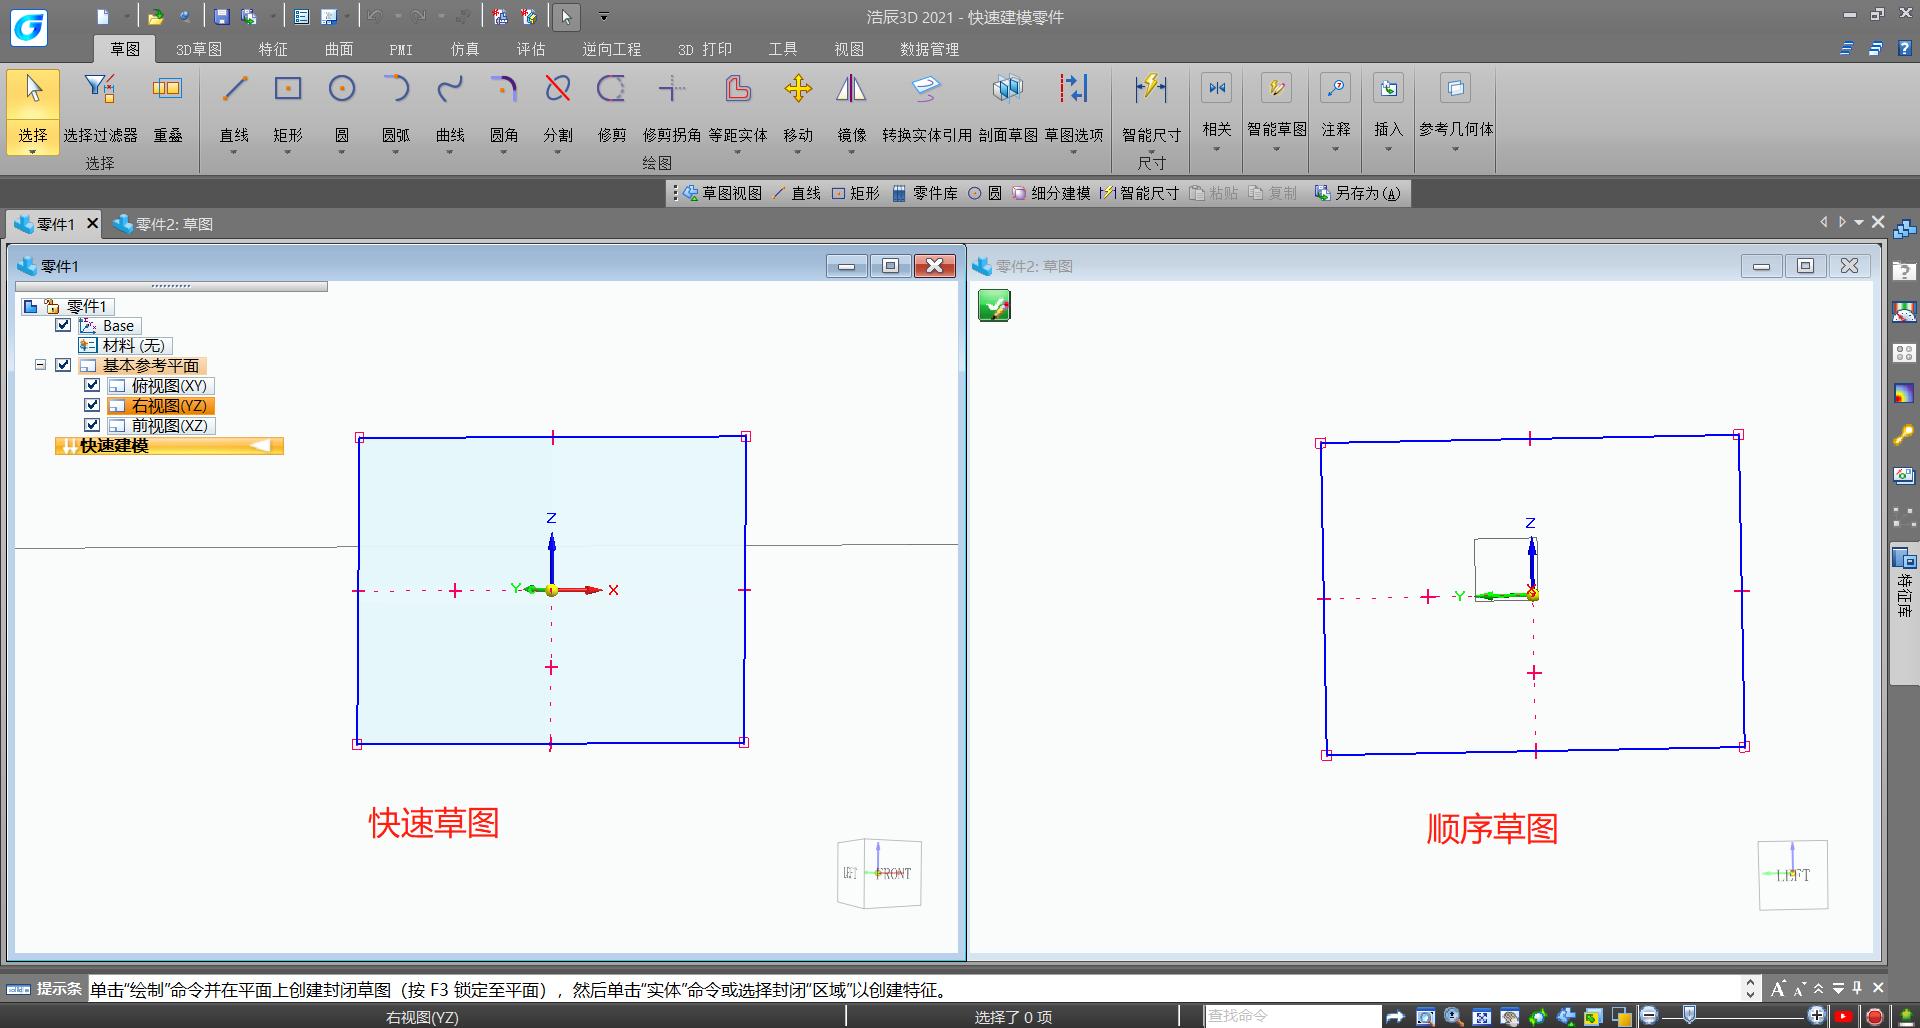 3D设计软件中快速草图与顺序草图的区别